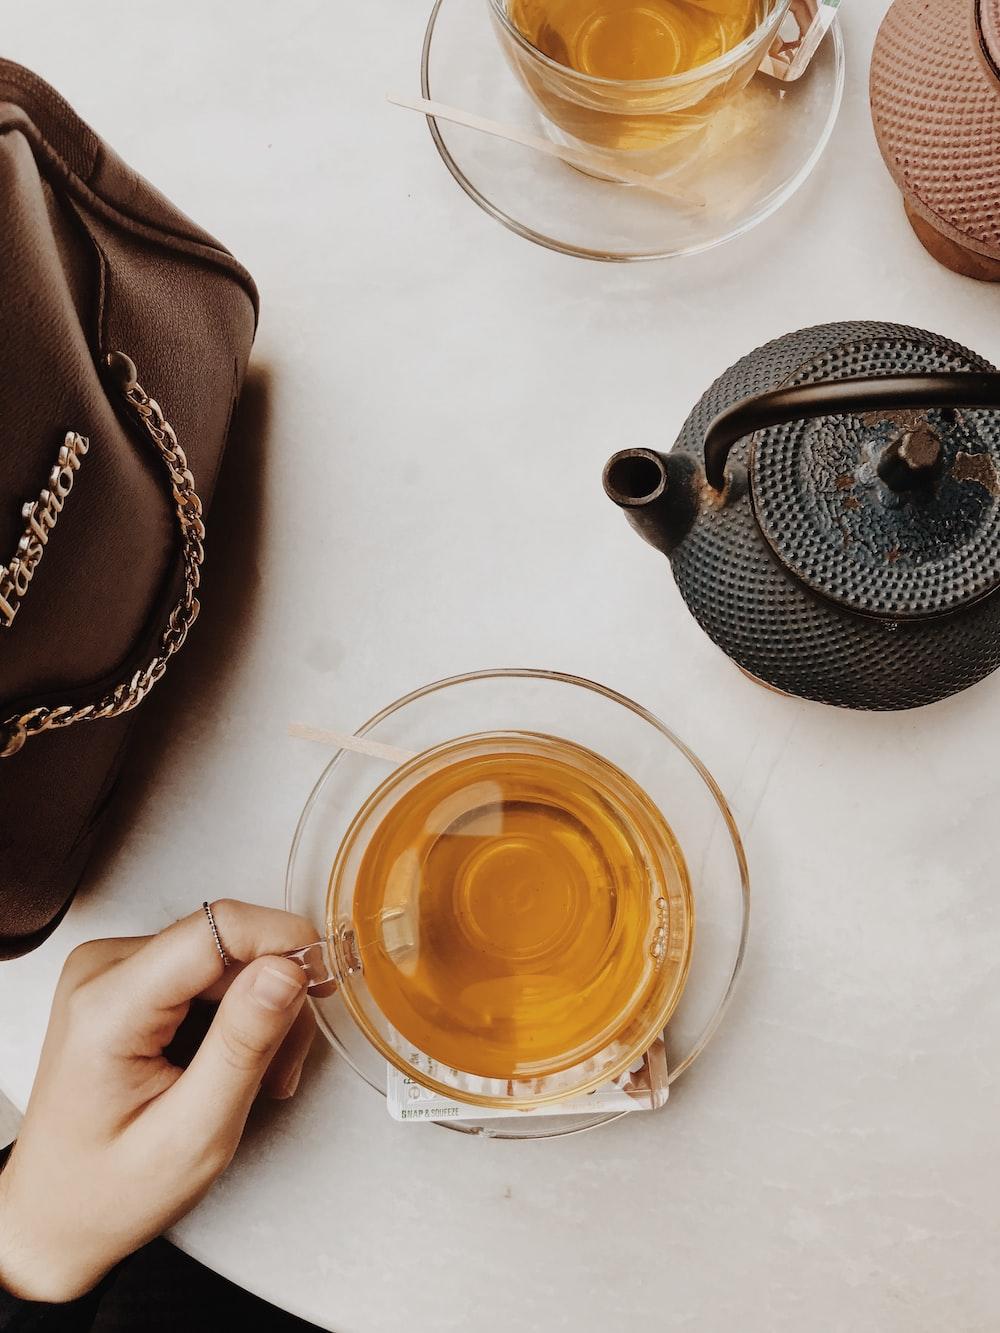 black ceramic teapot on white ceramic saucer